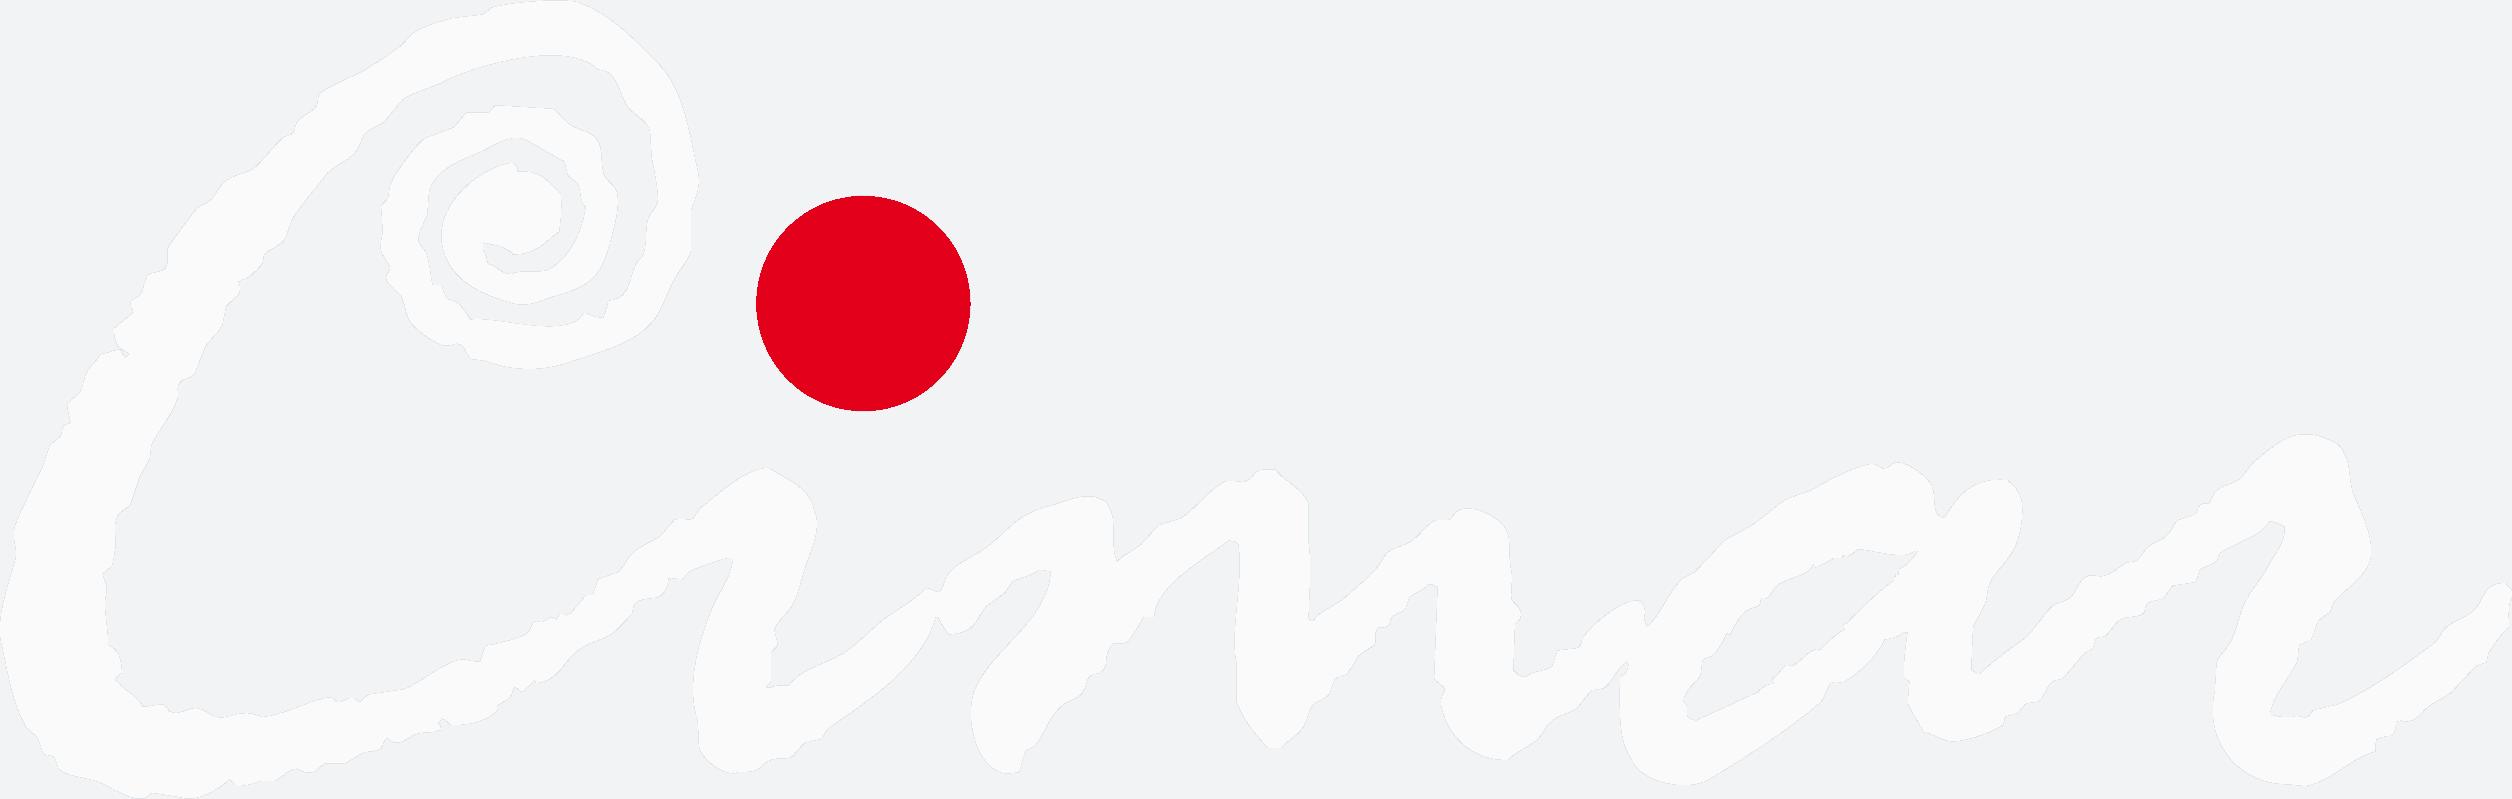 Cimar produzione S.r.l.